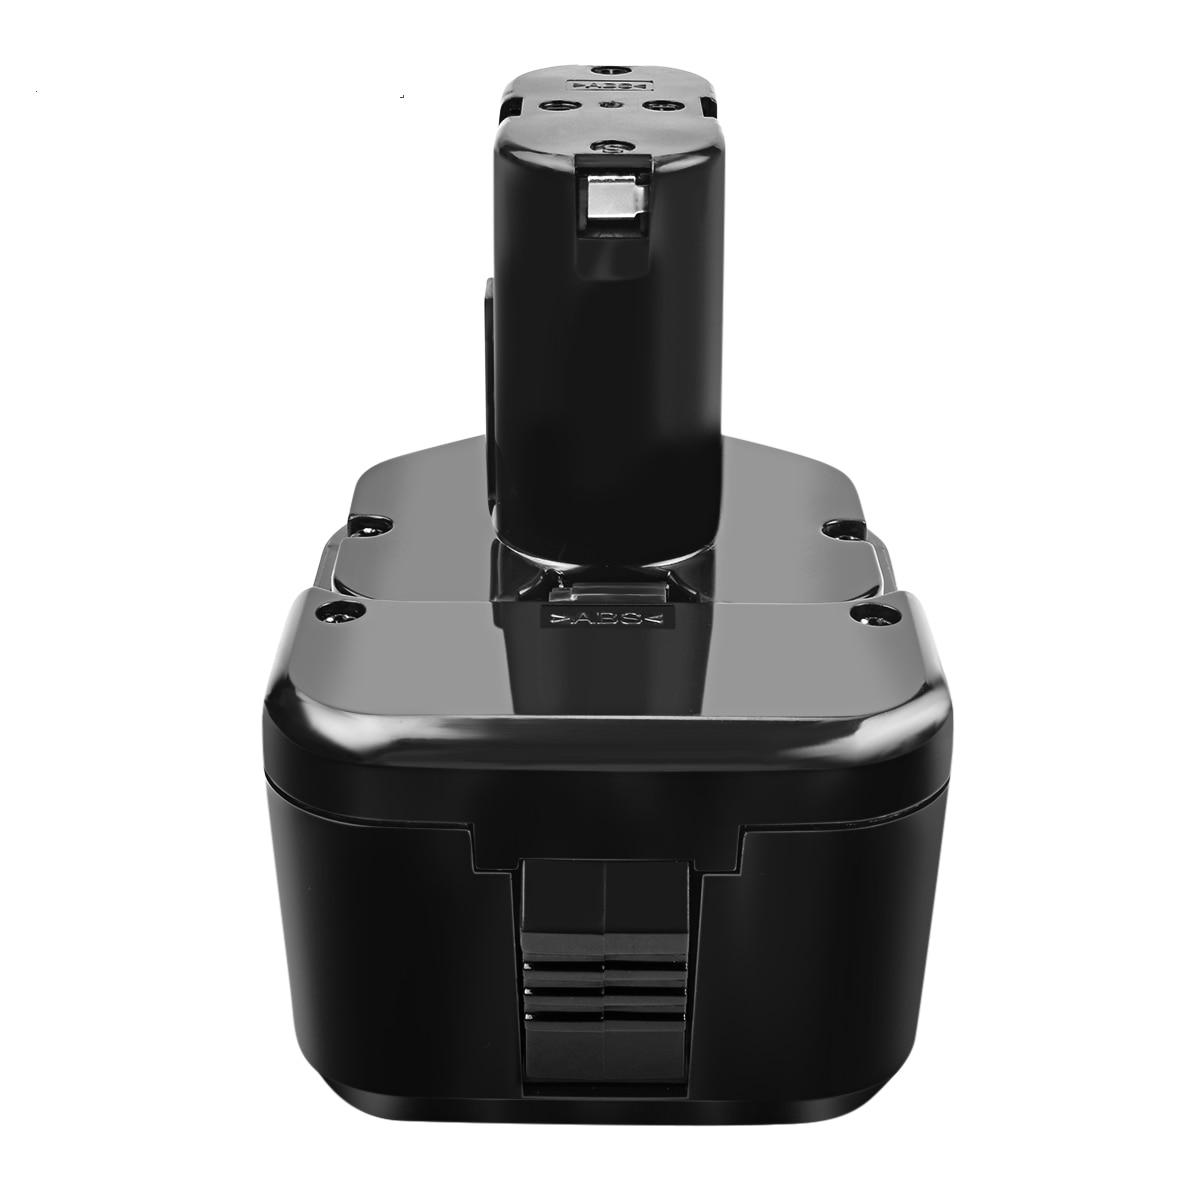 Bonadget 12V 3.5Ah batería para Hitachi EB1214S EB1212S EB1220HS 324360 322434 Eb1220bl DS12DVF3 DN12DY DH15DV EB1220HL batería